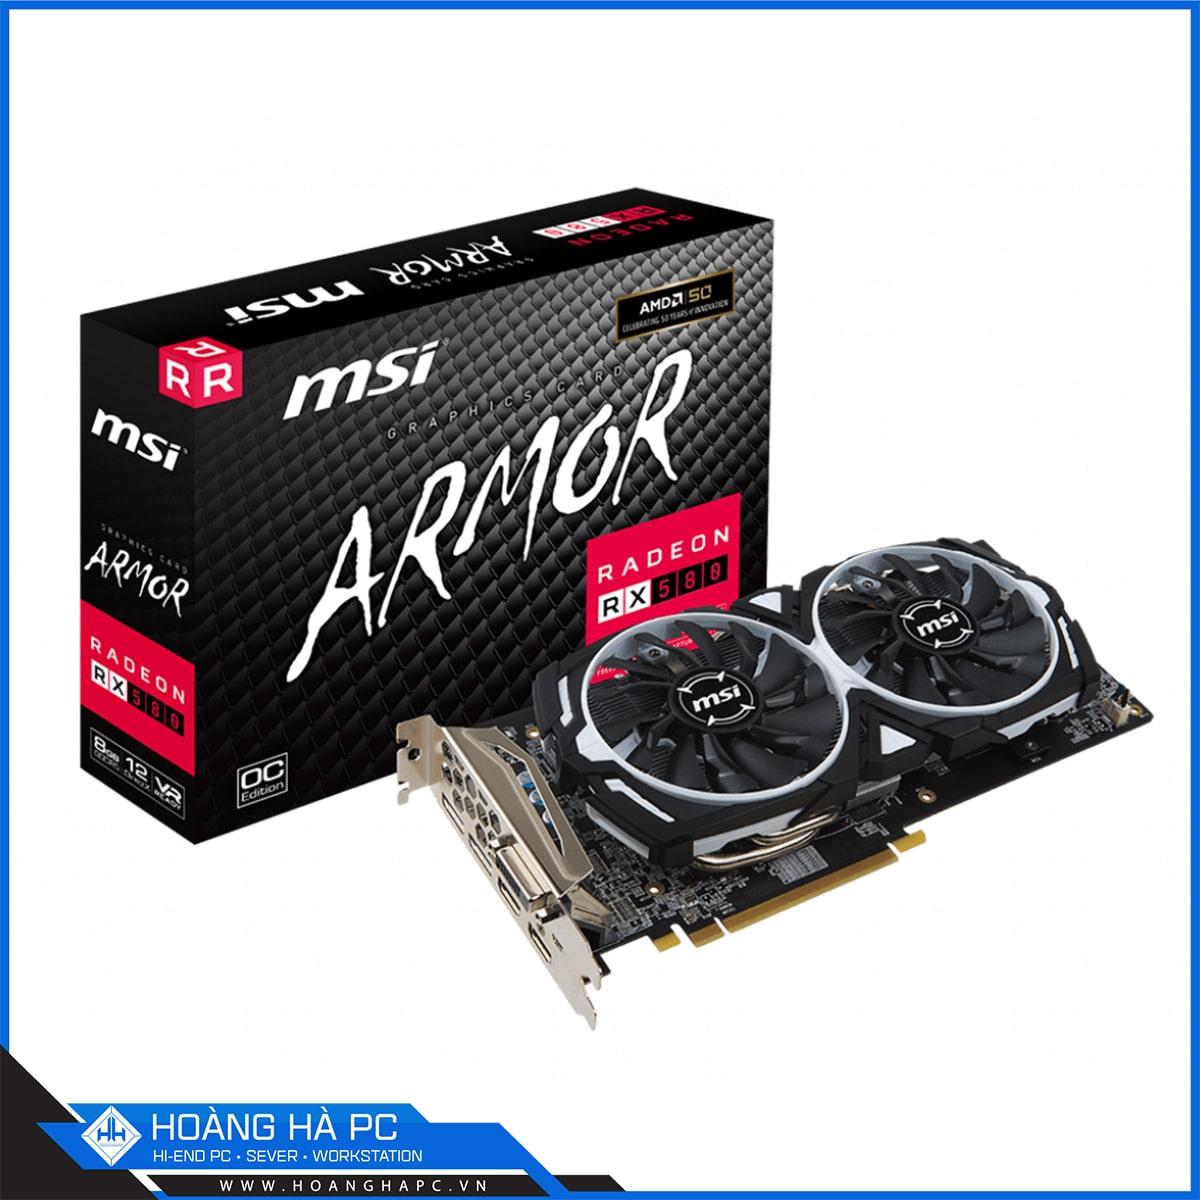 MSI Radeon RX 580 ARMOR 8G O